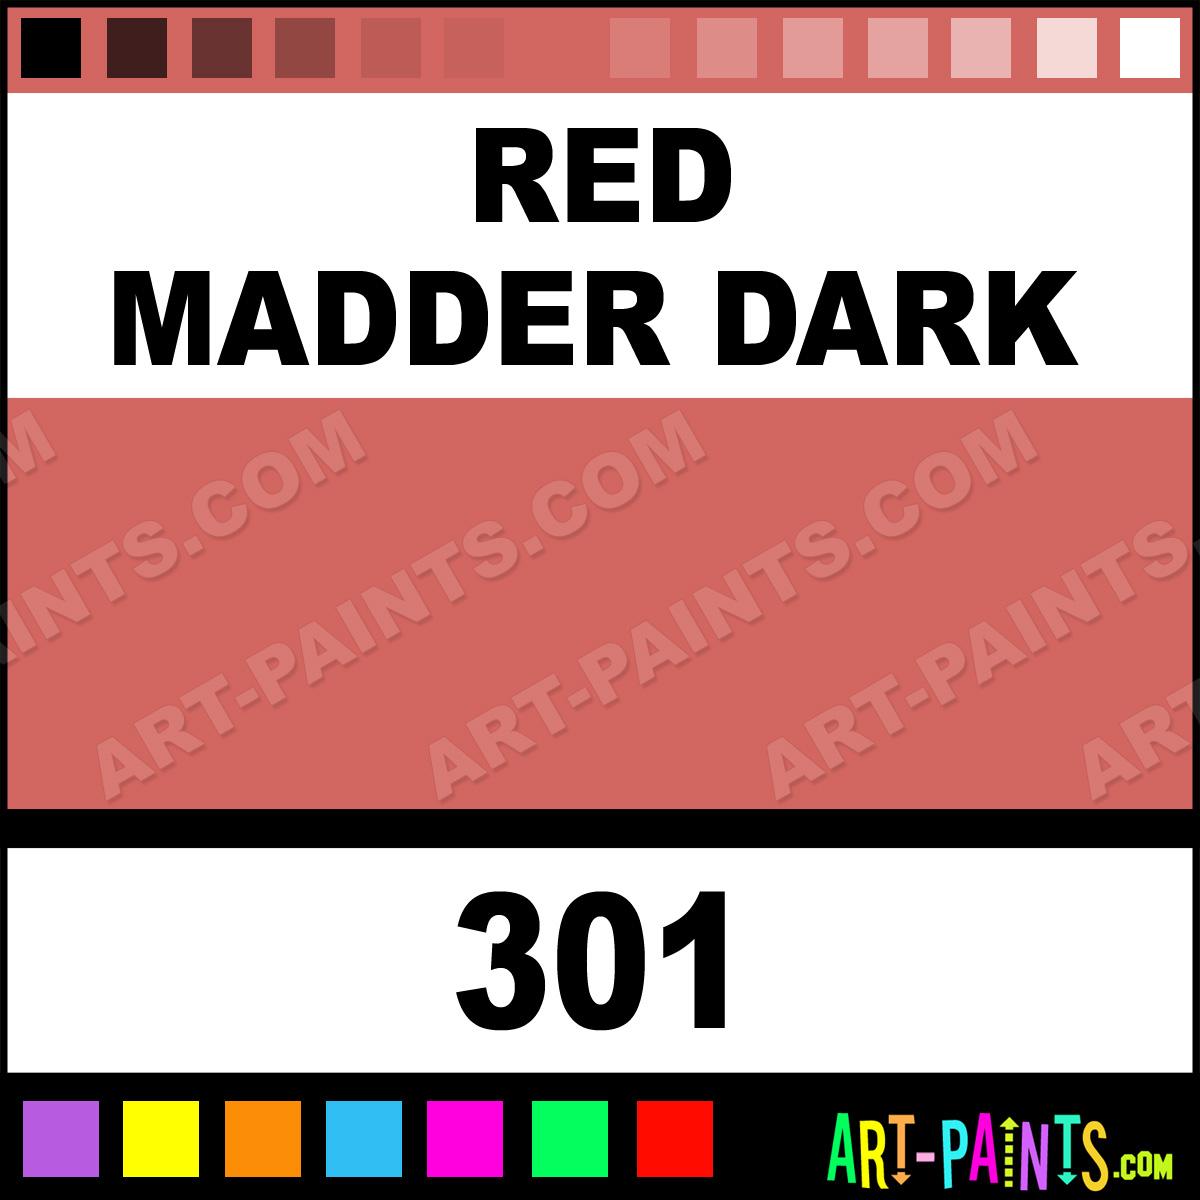 Red Madder Dark Professional Airbrush Spray Paints 301 Red Madder Dark Paint Red Madder